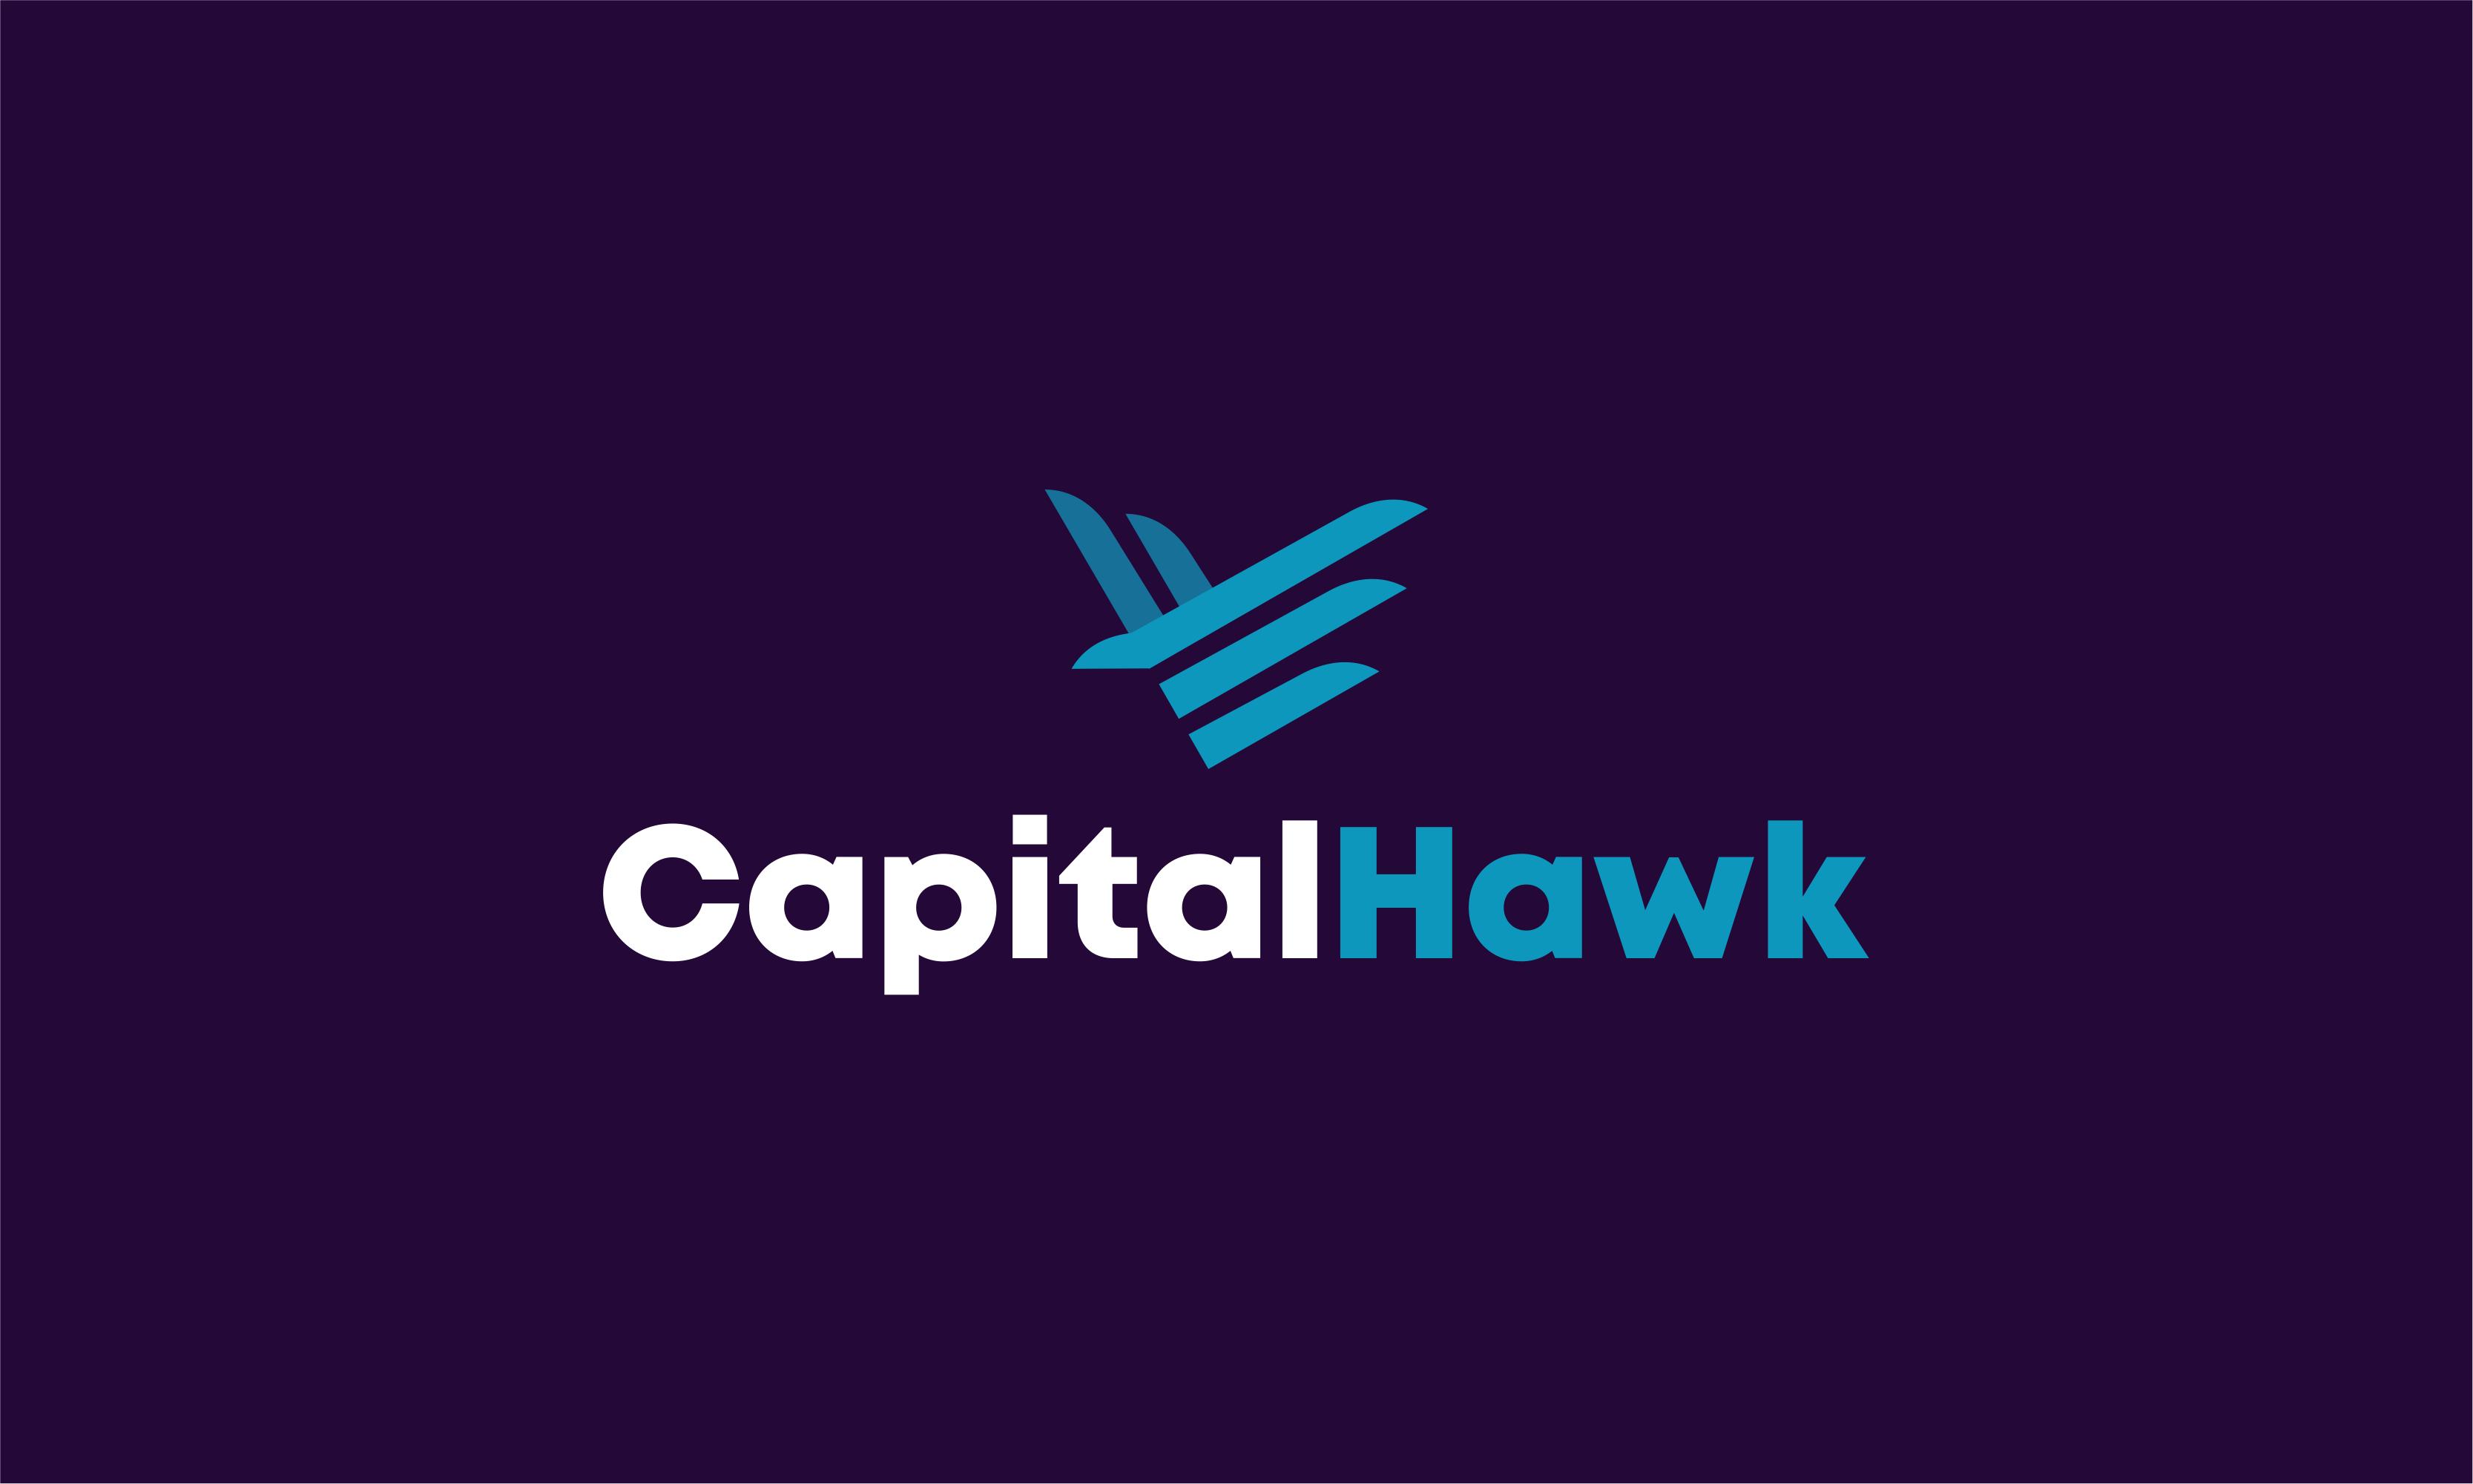 Capitalhawk